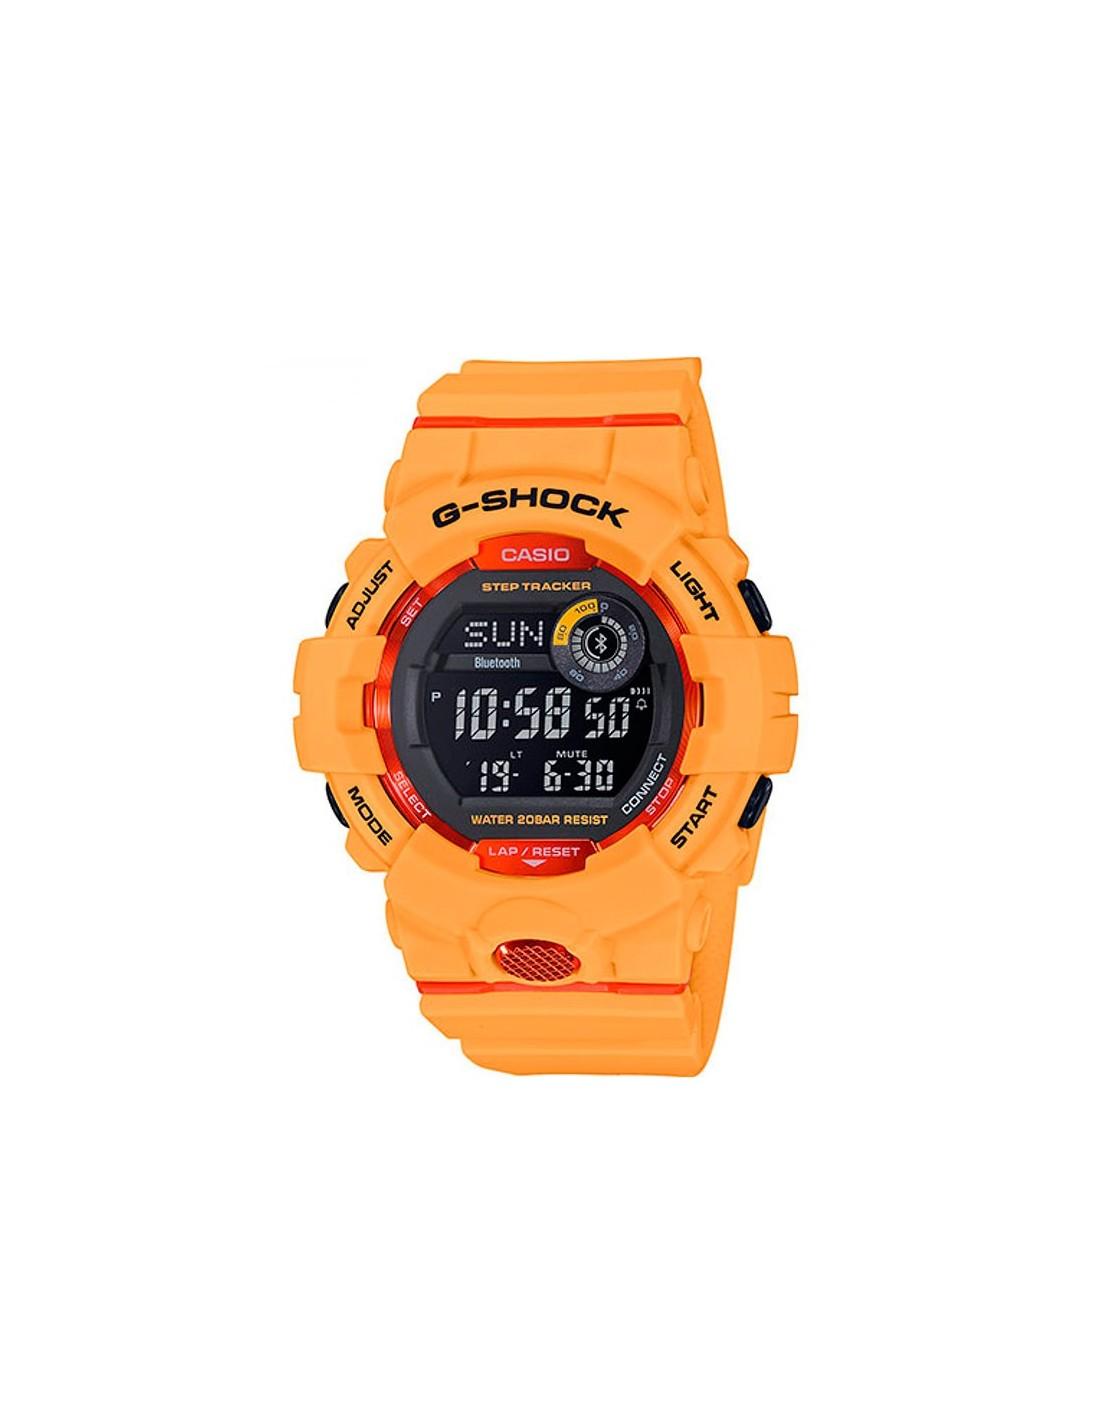 Gdb 800 4er Casio Watch Gbd 800 4er G Shock